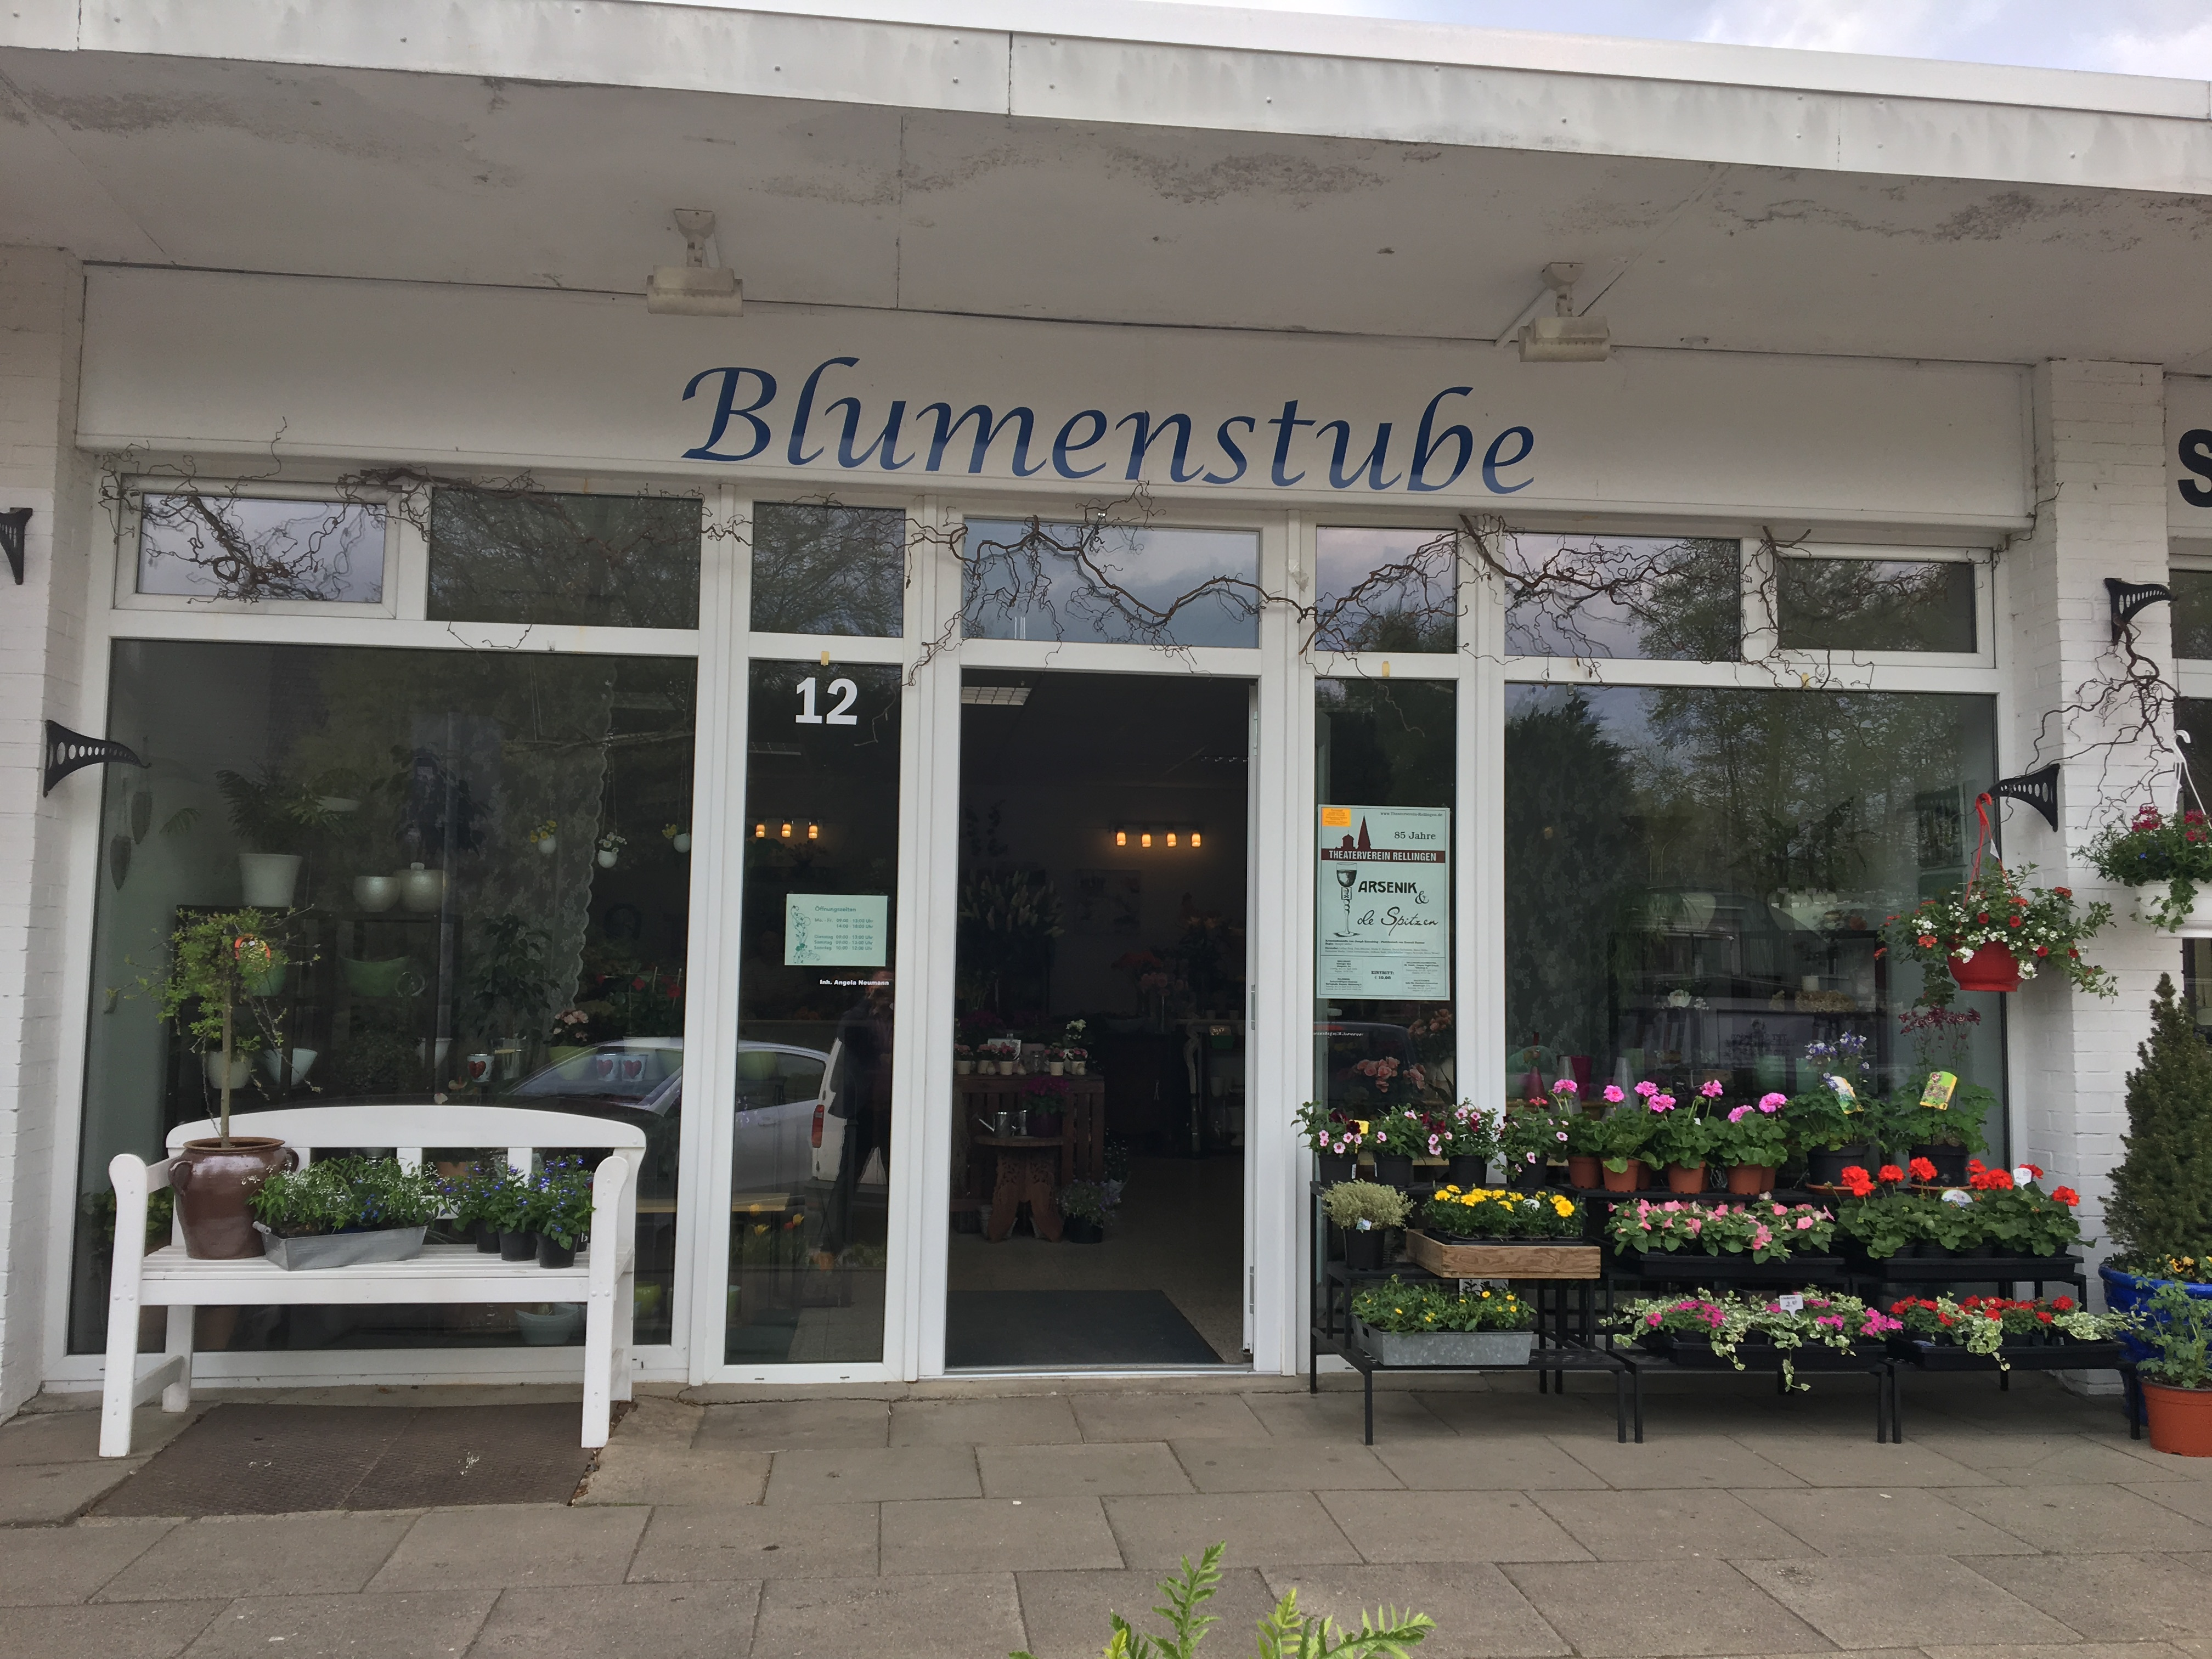 Blumenstube Neumann